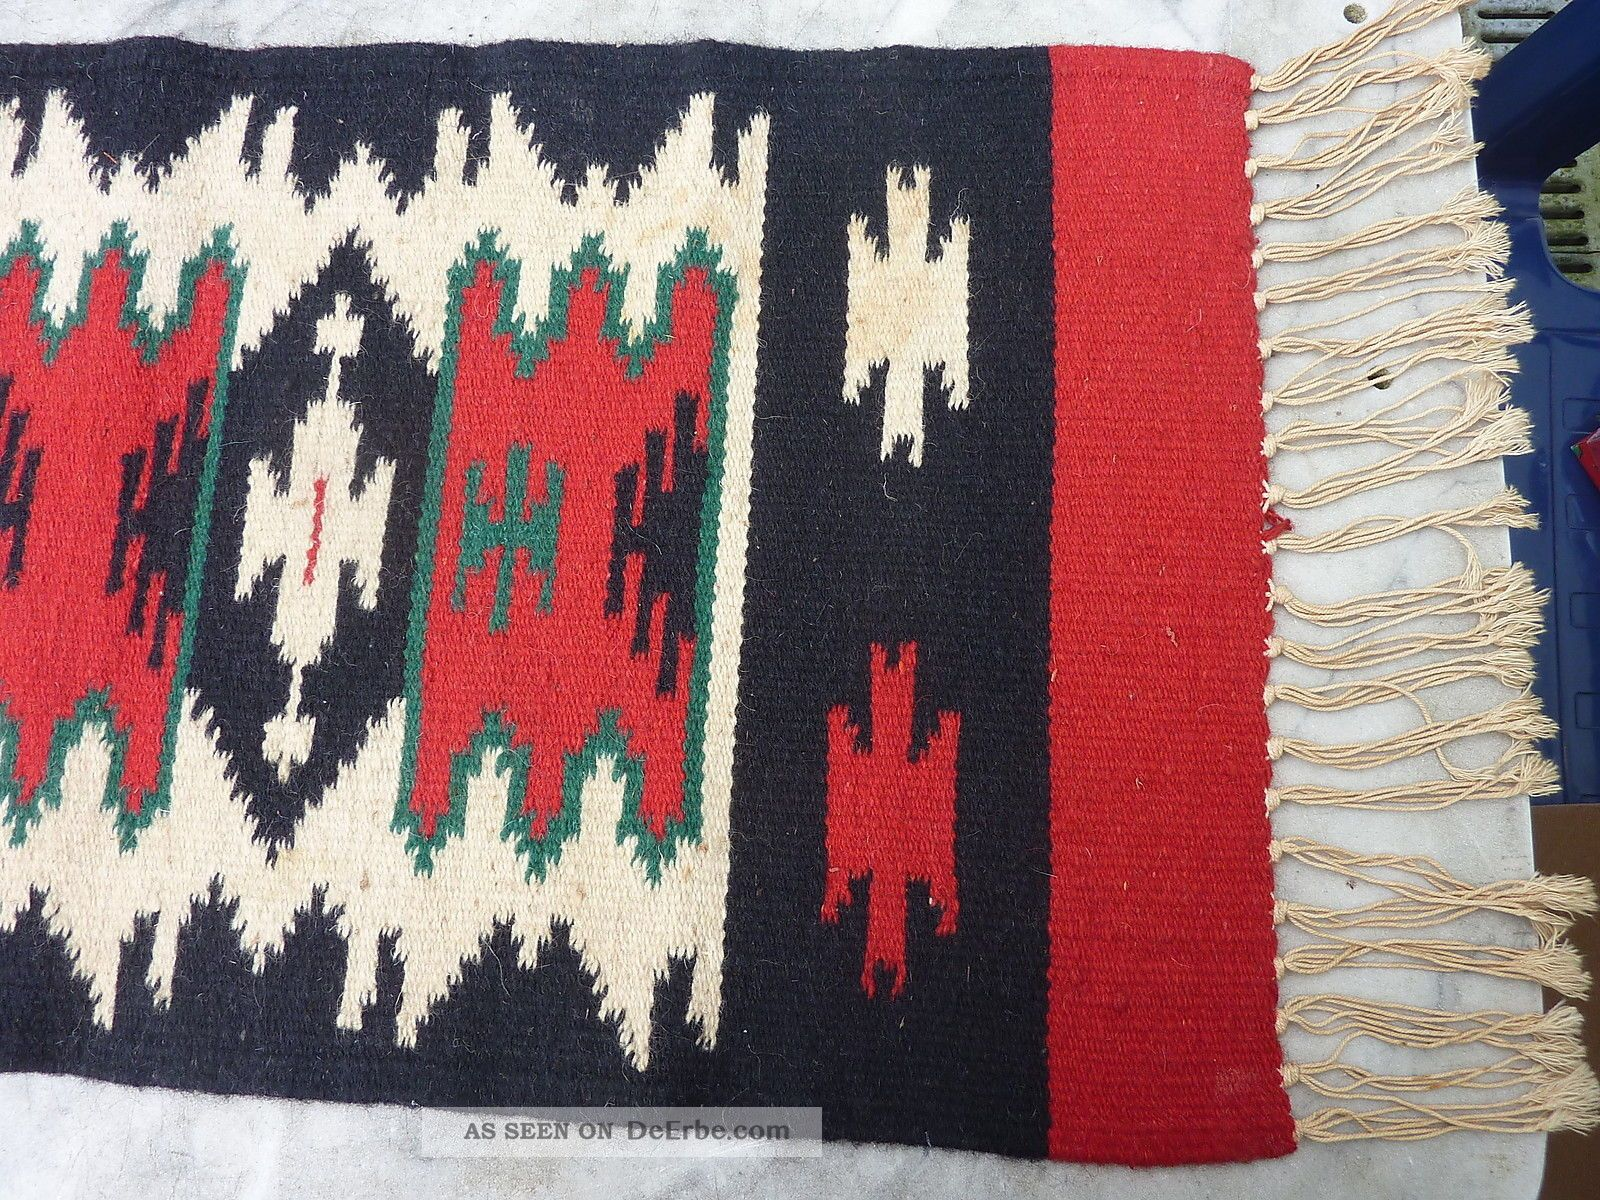 orient teppich l ufer br cke wandteppich kelim wolle gewebt ca 37 x 78 cm rot. Black Bedroom Furniture Sets. Home Design Ideas